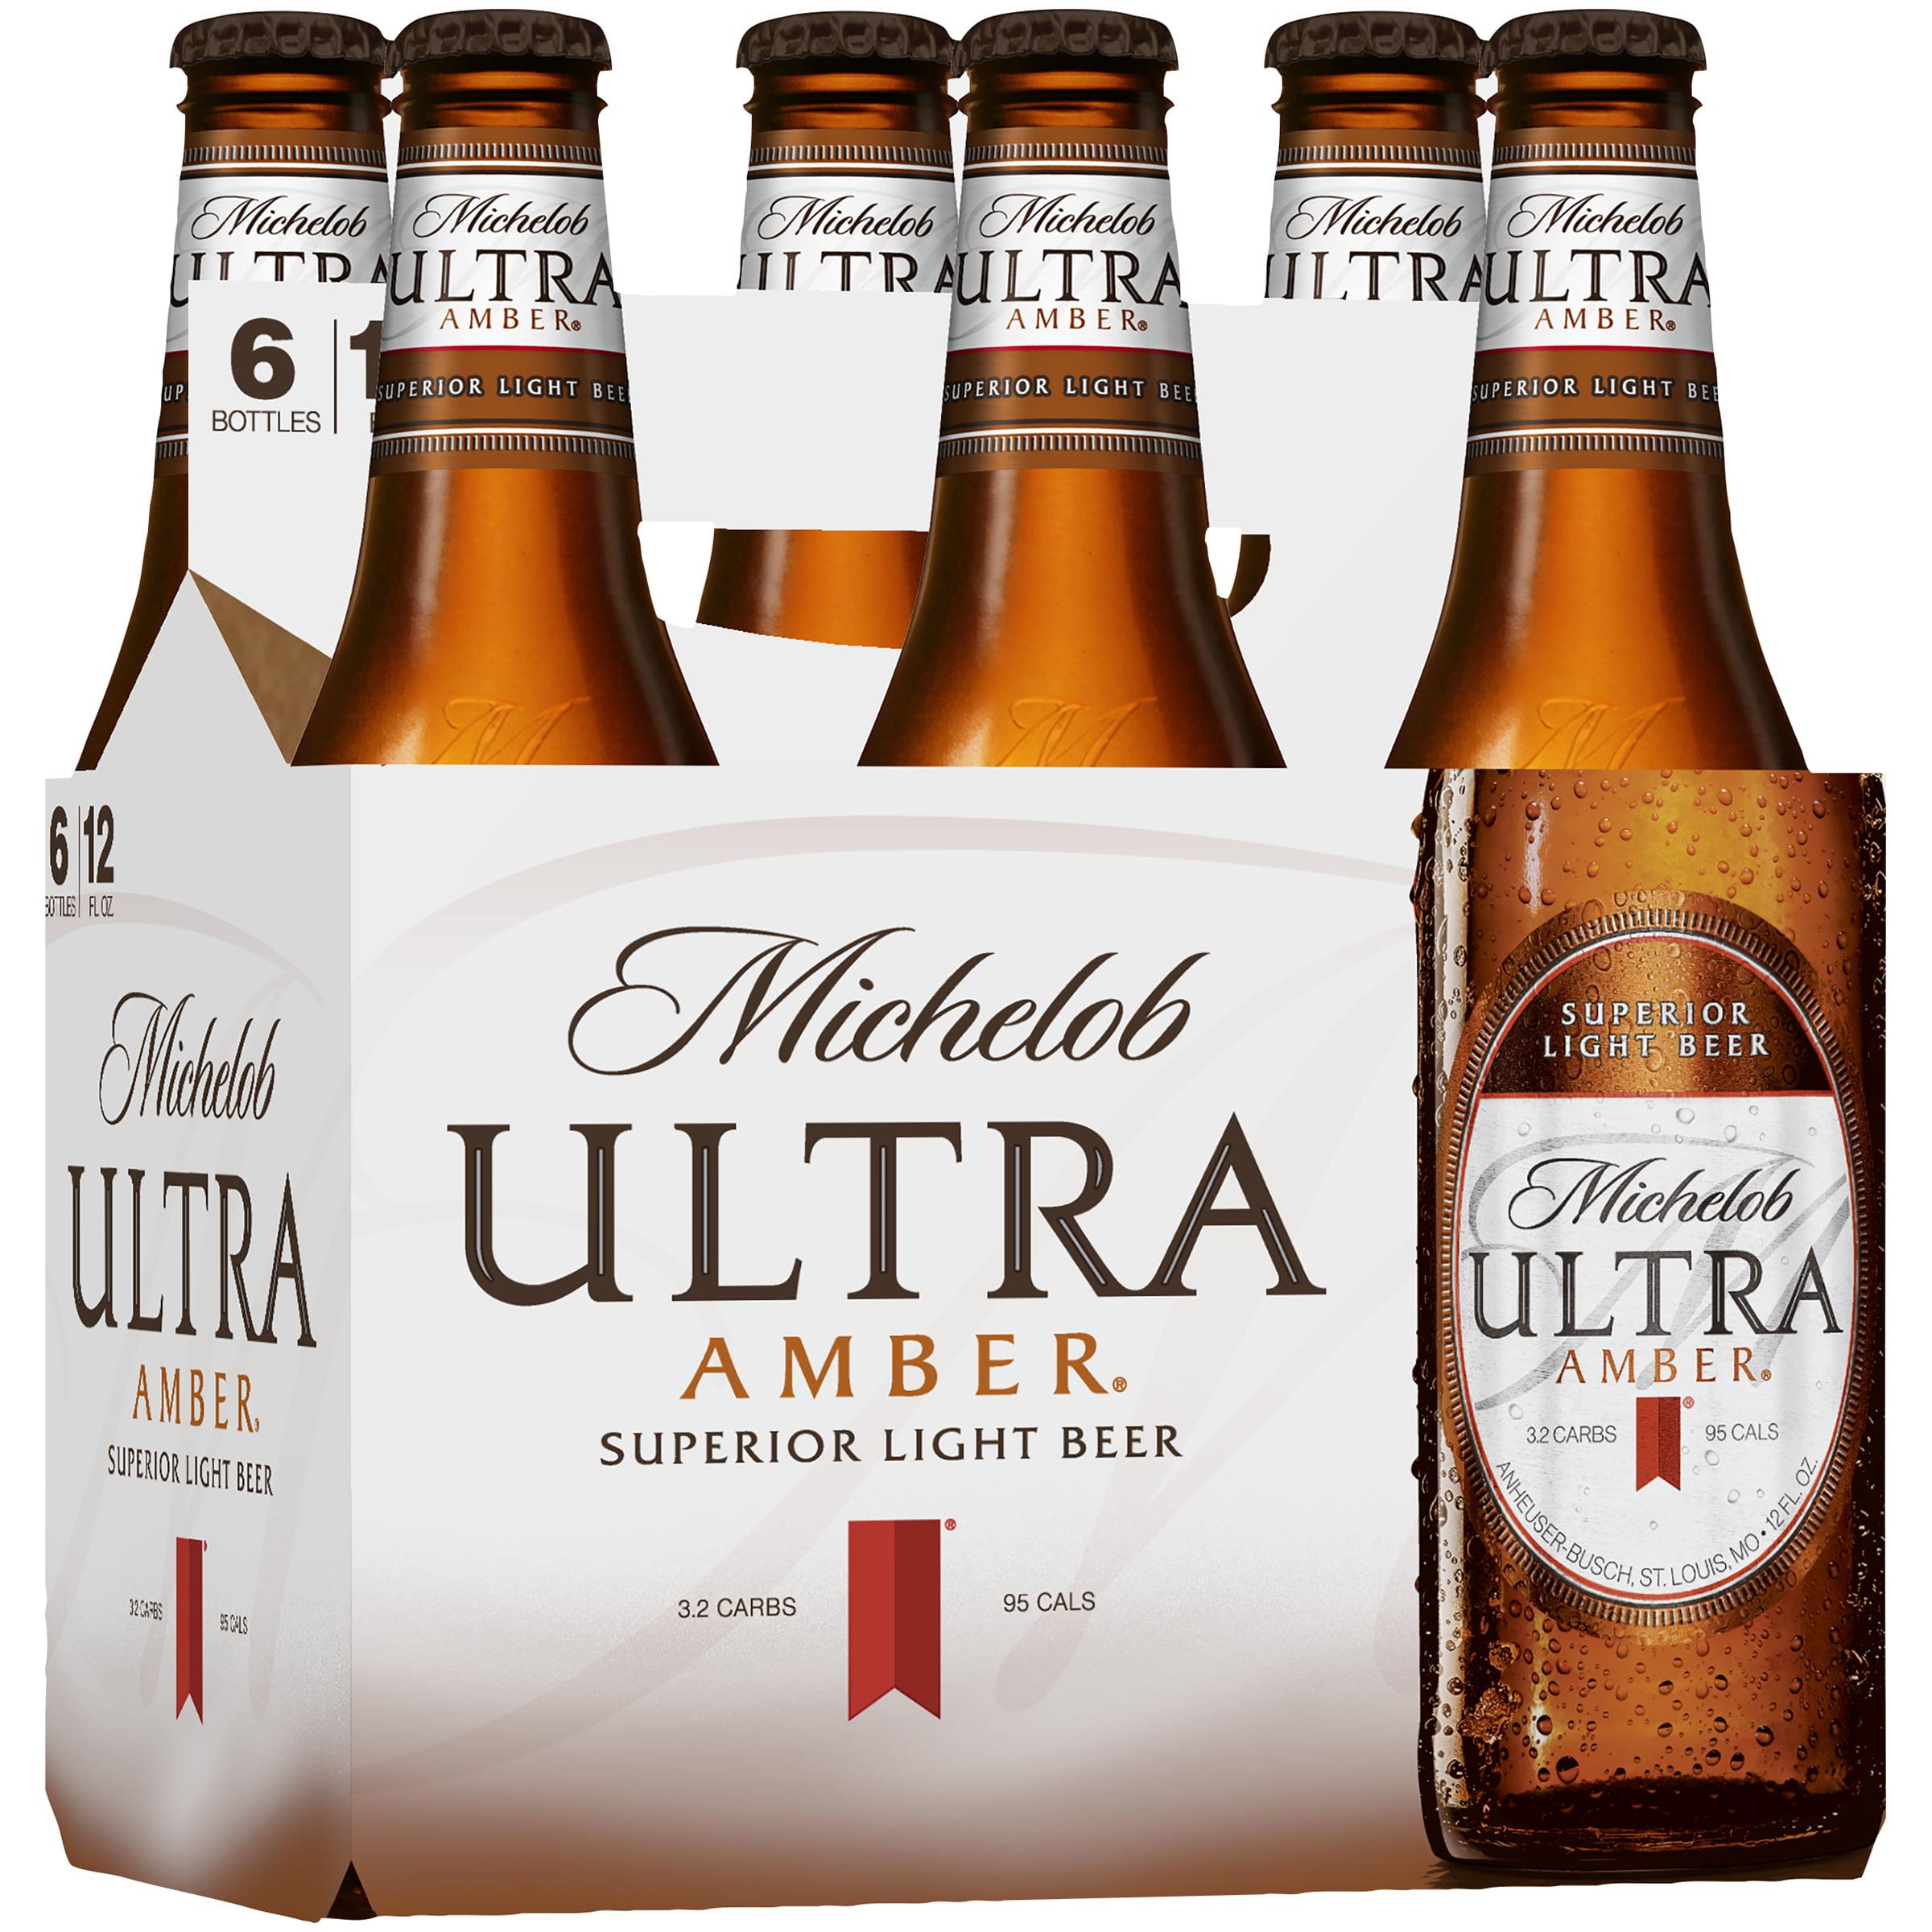 Michelob Ultra Amber Lager 6 Pk 12 Fl Oz Bottles